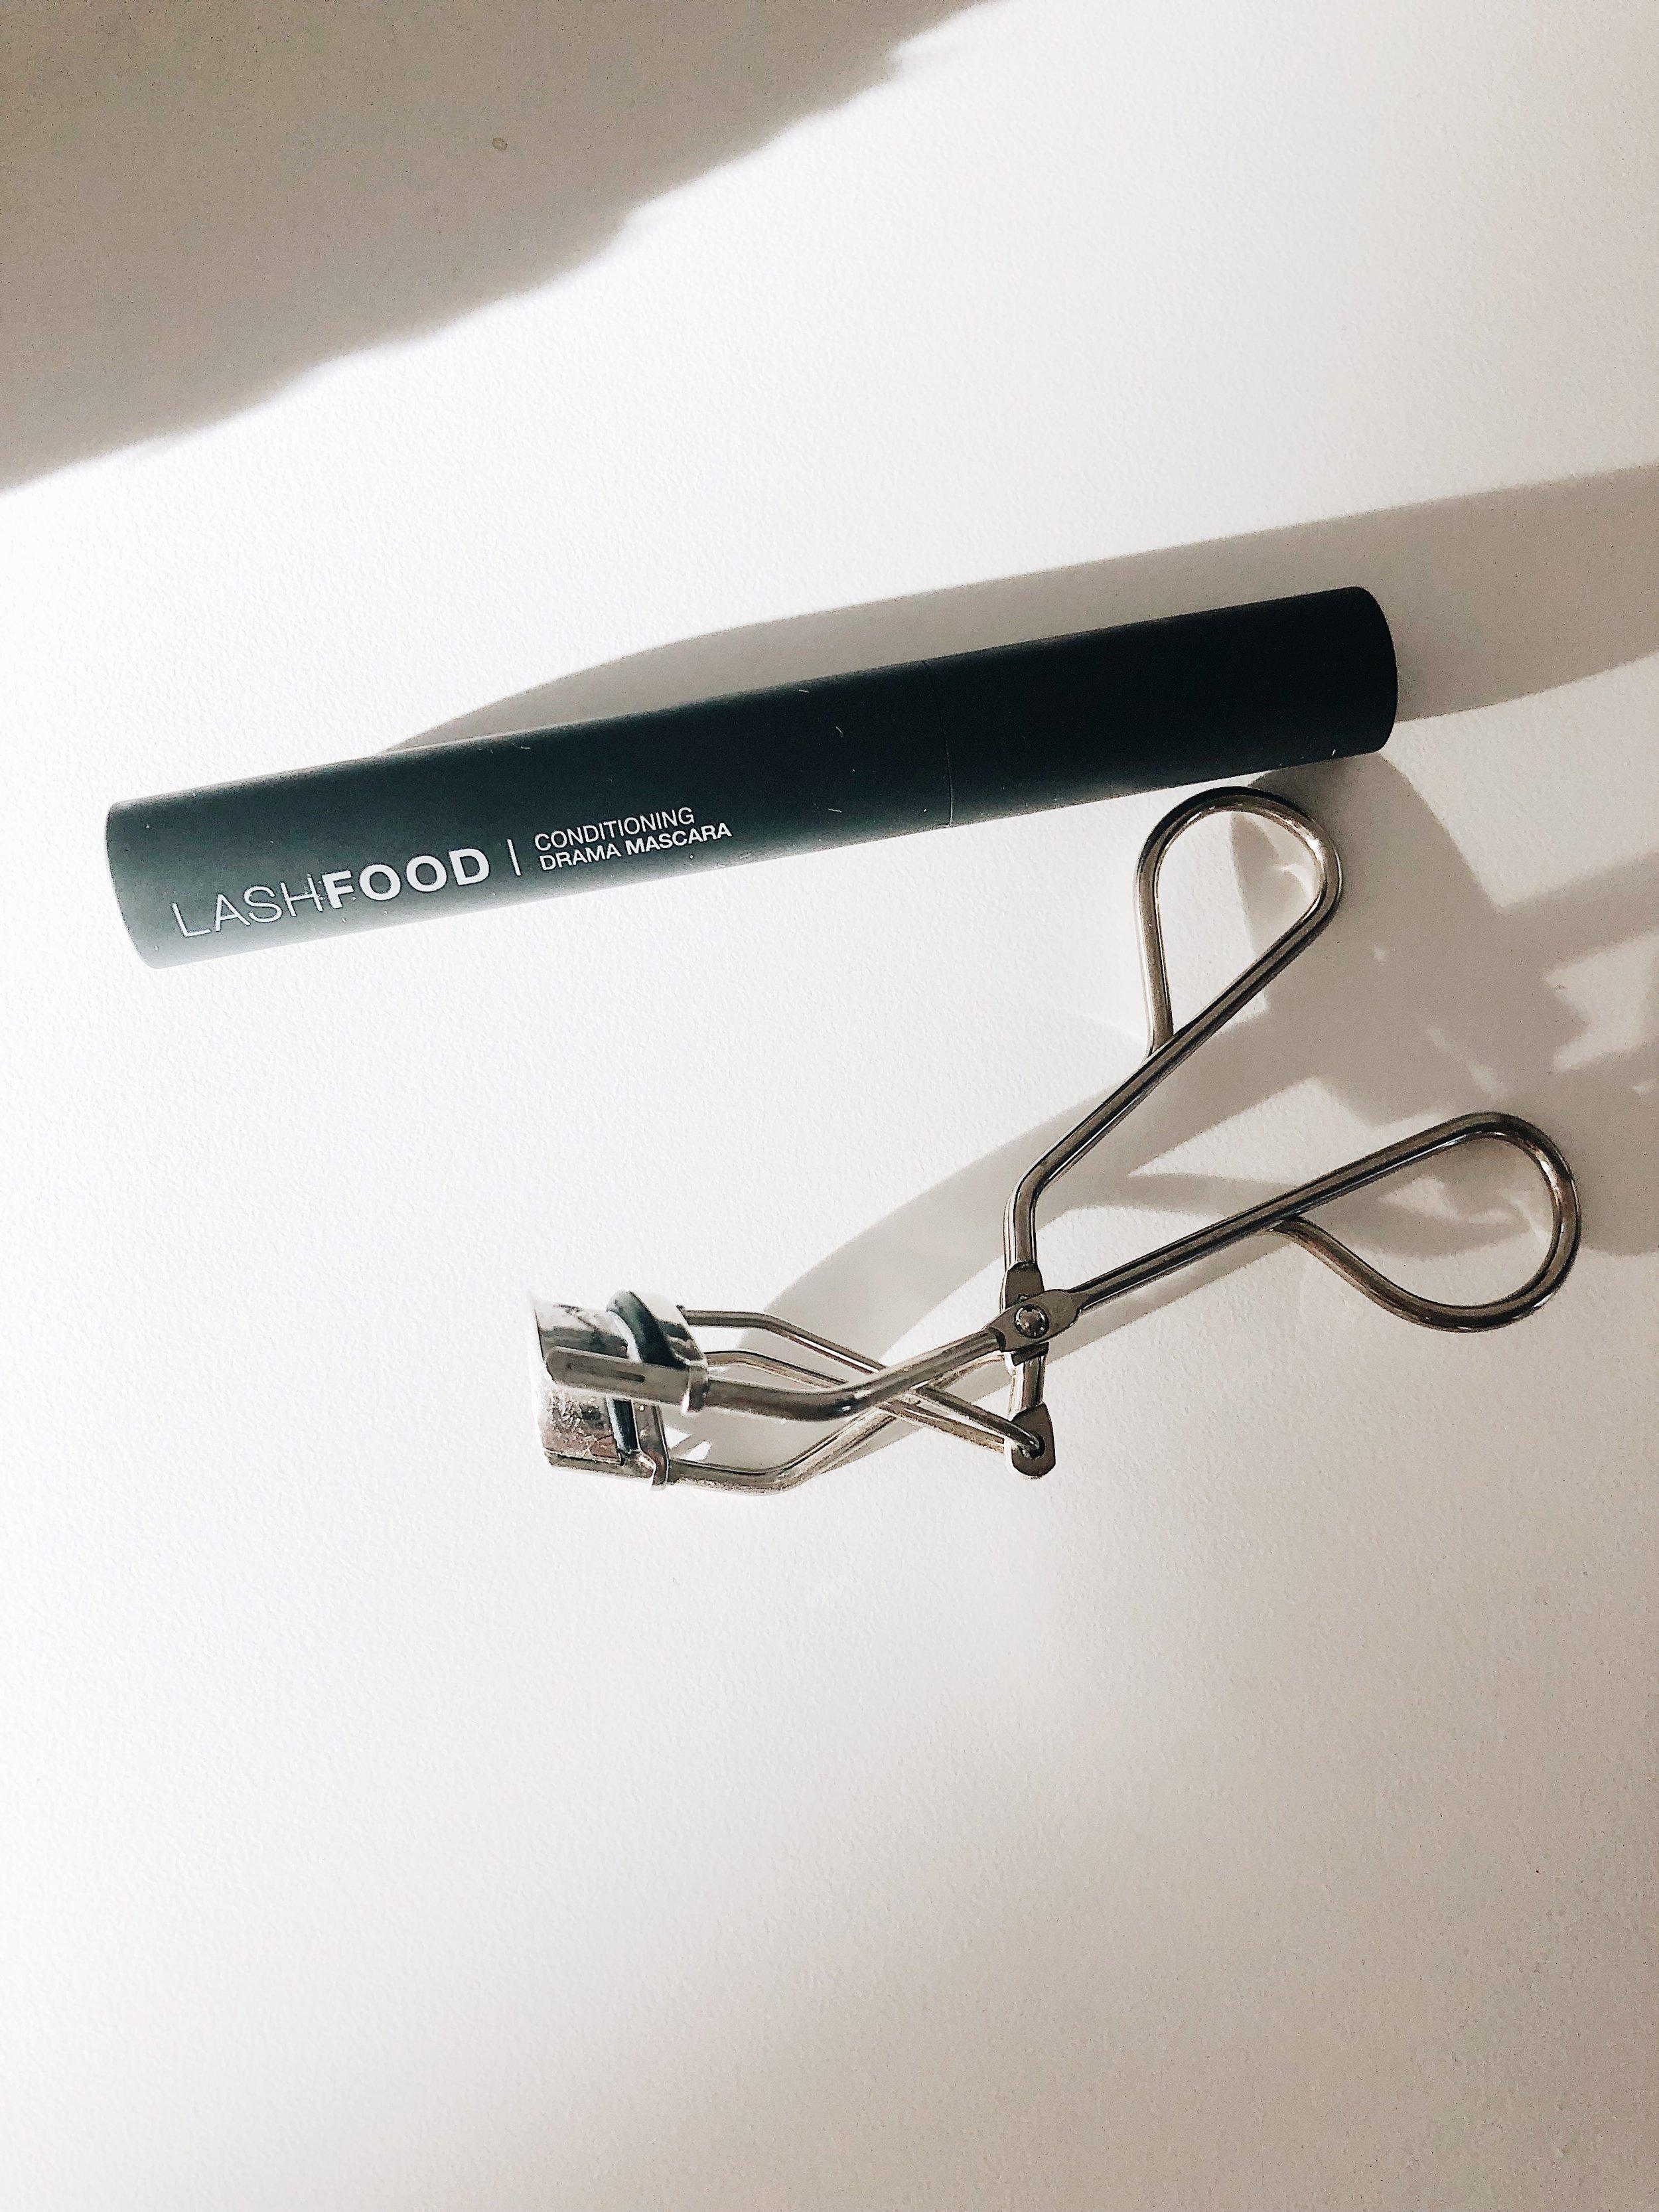 Curl + apply LASHFOOD mascara.